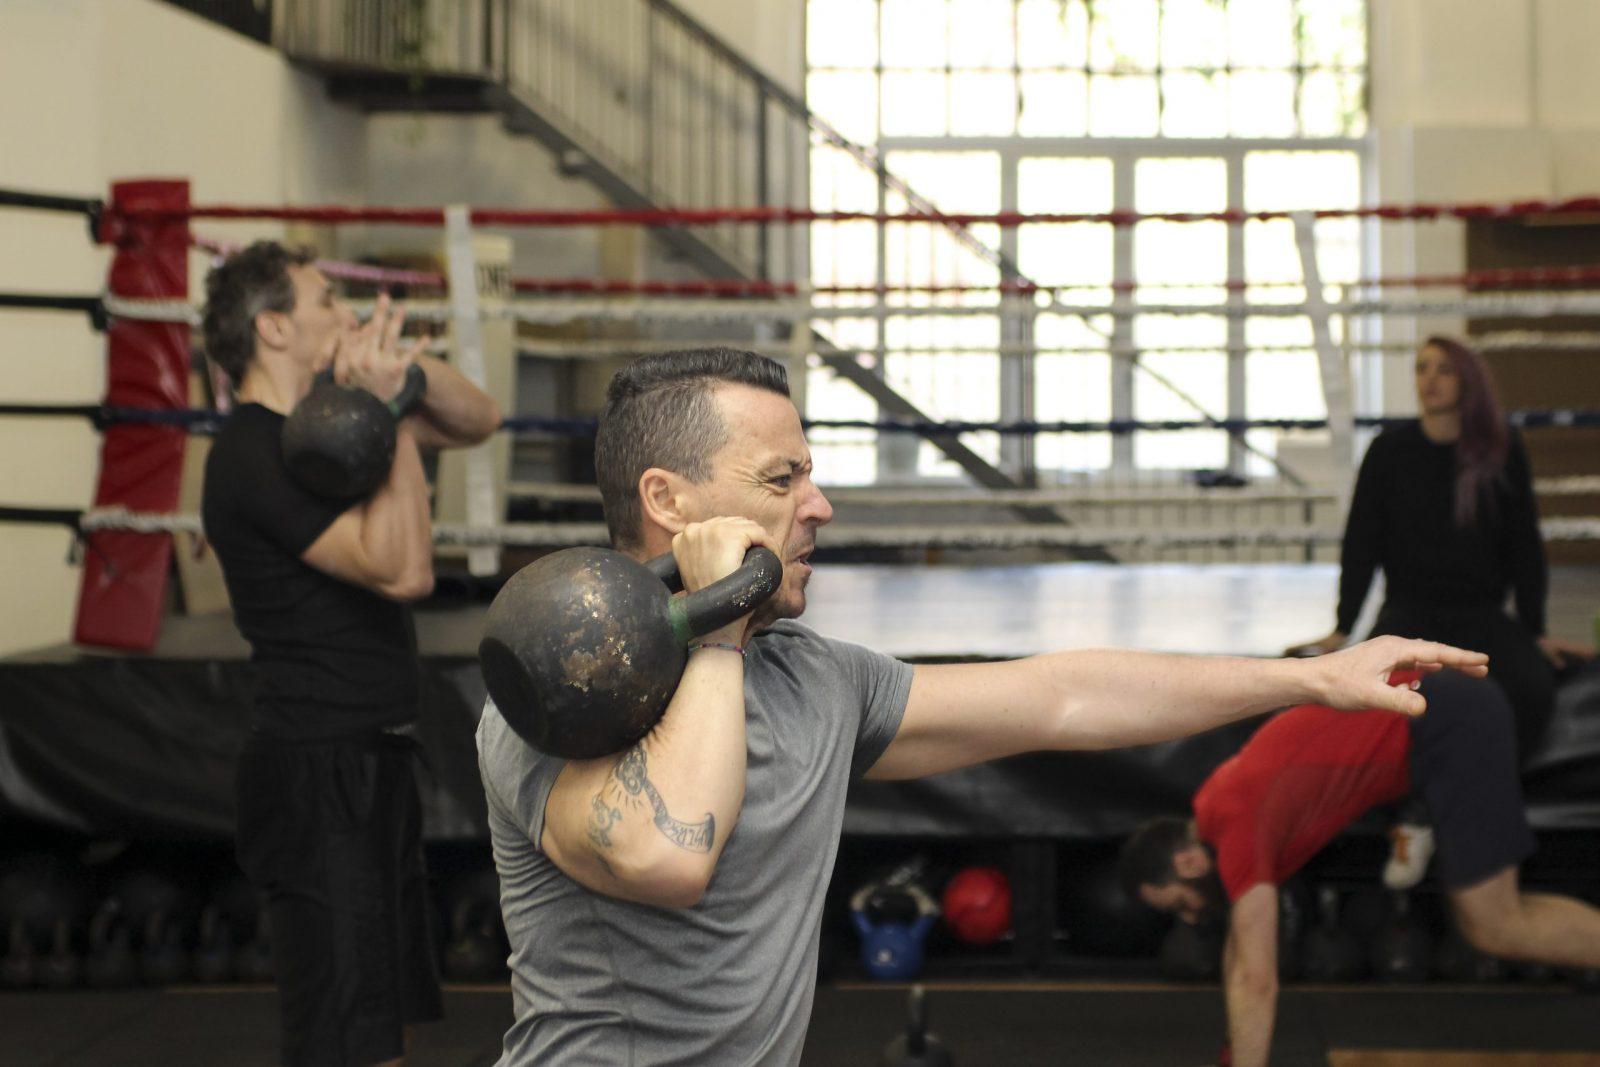 Heracles Gymnasium Funzionale Boxe E Lifestyle